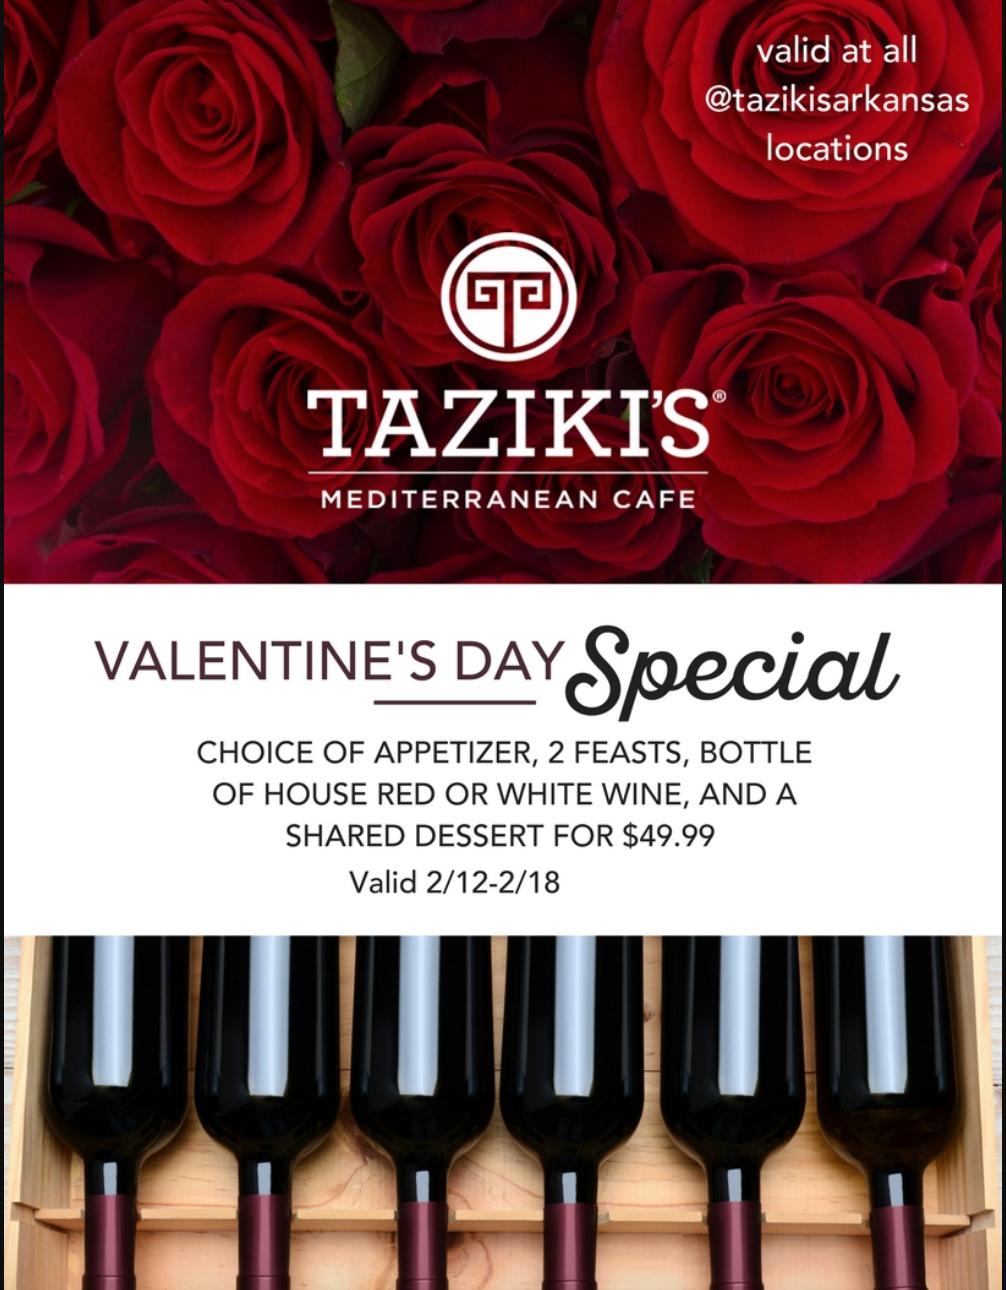 Taziki's valentine's day special email.